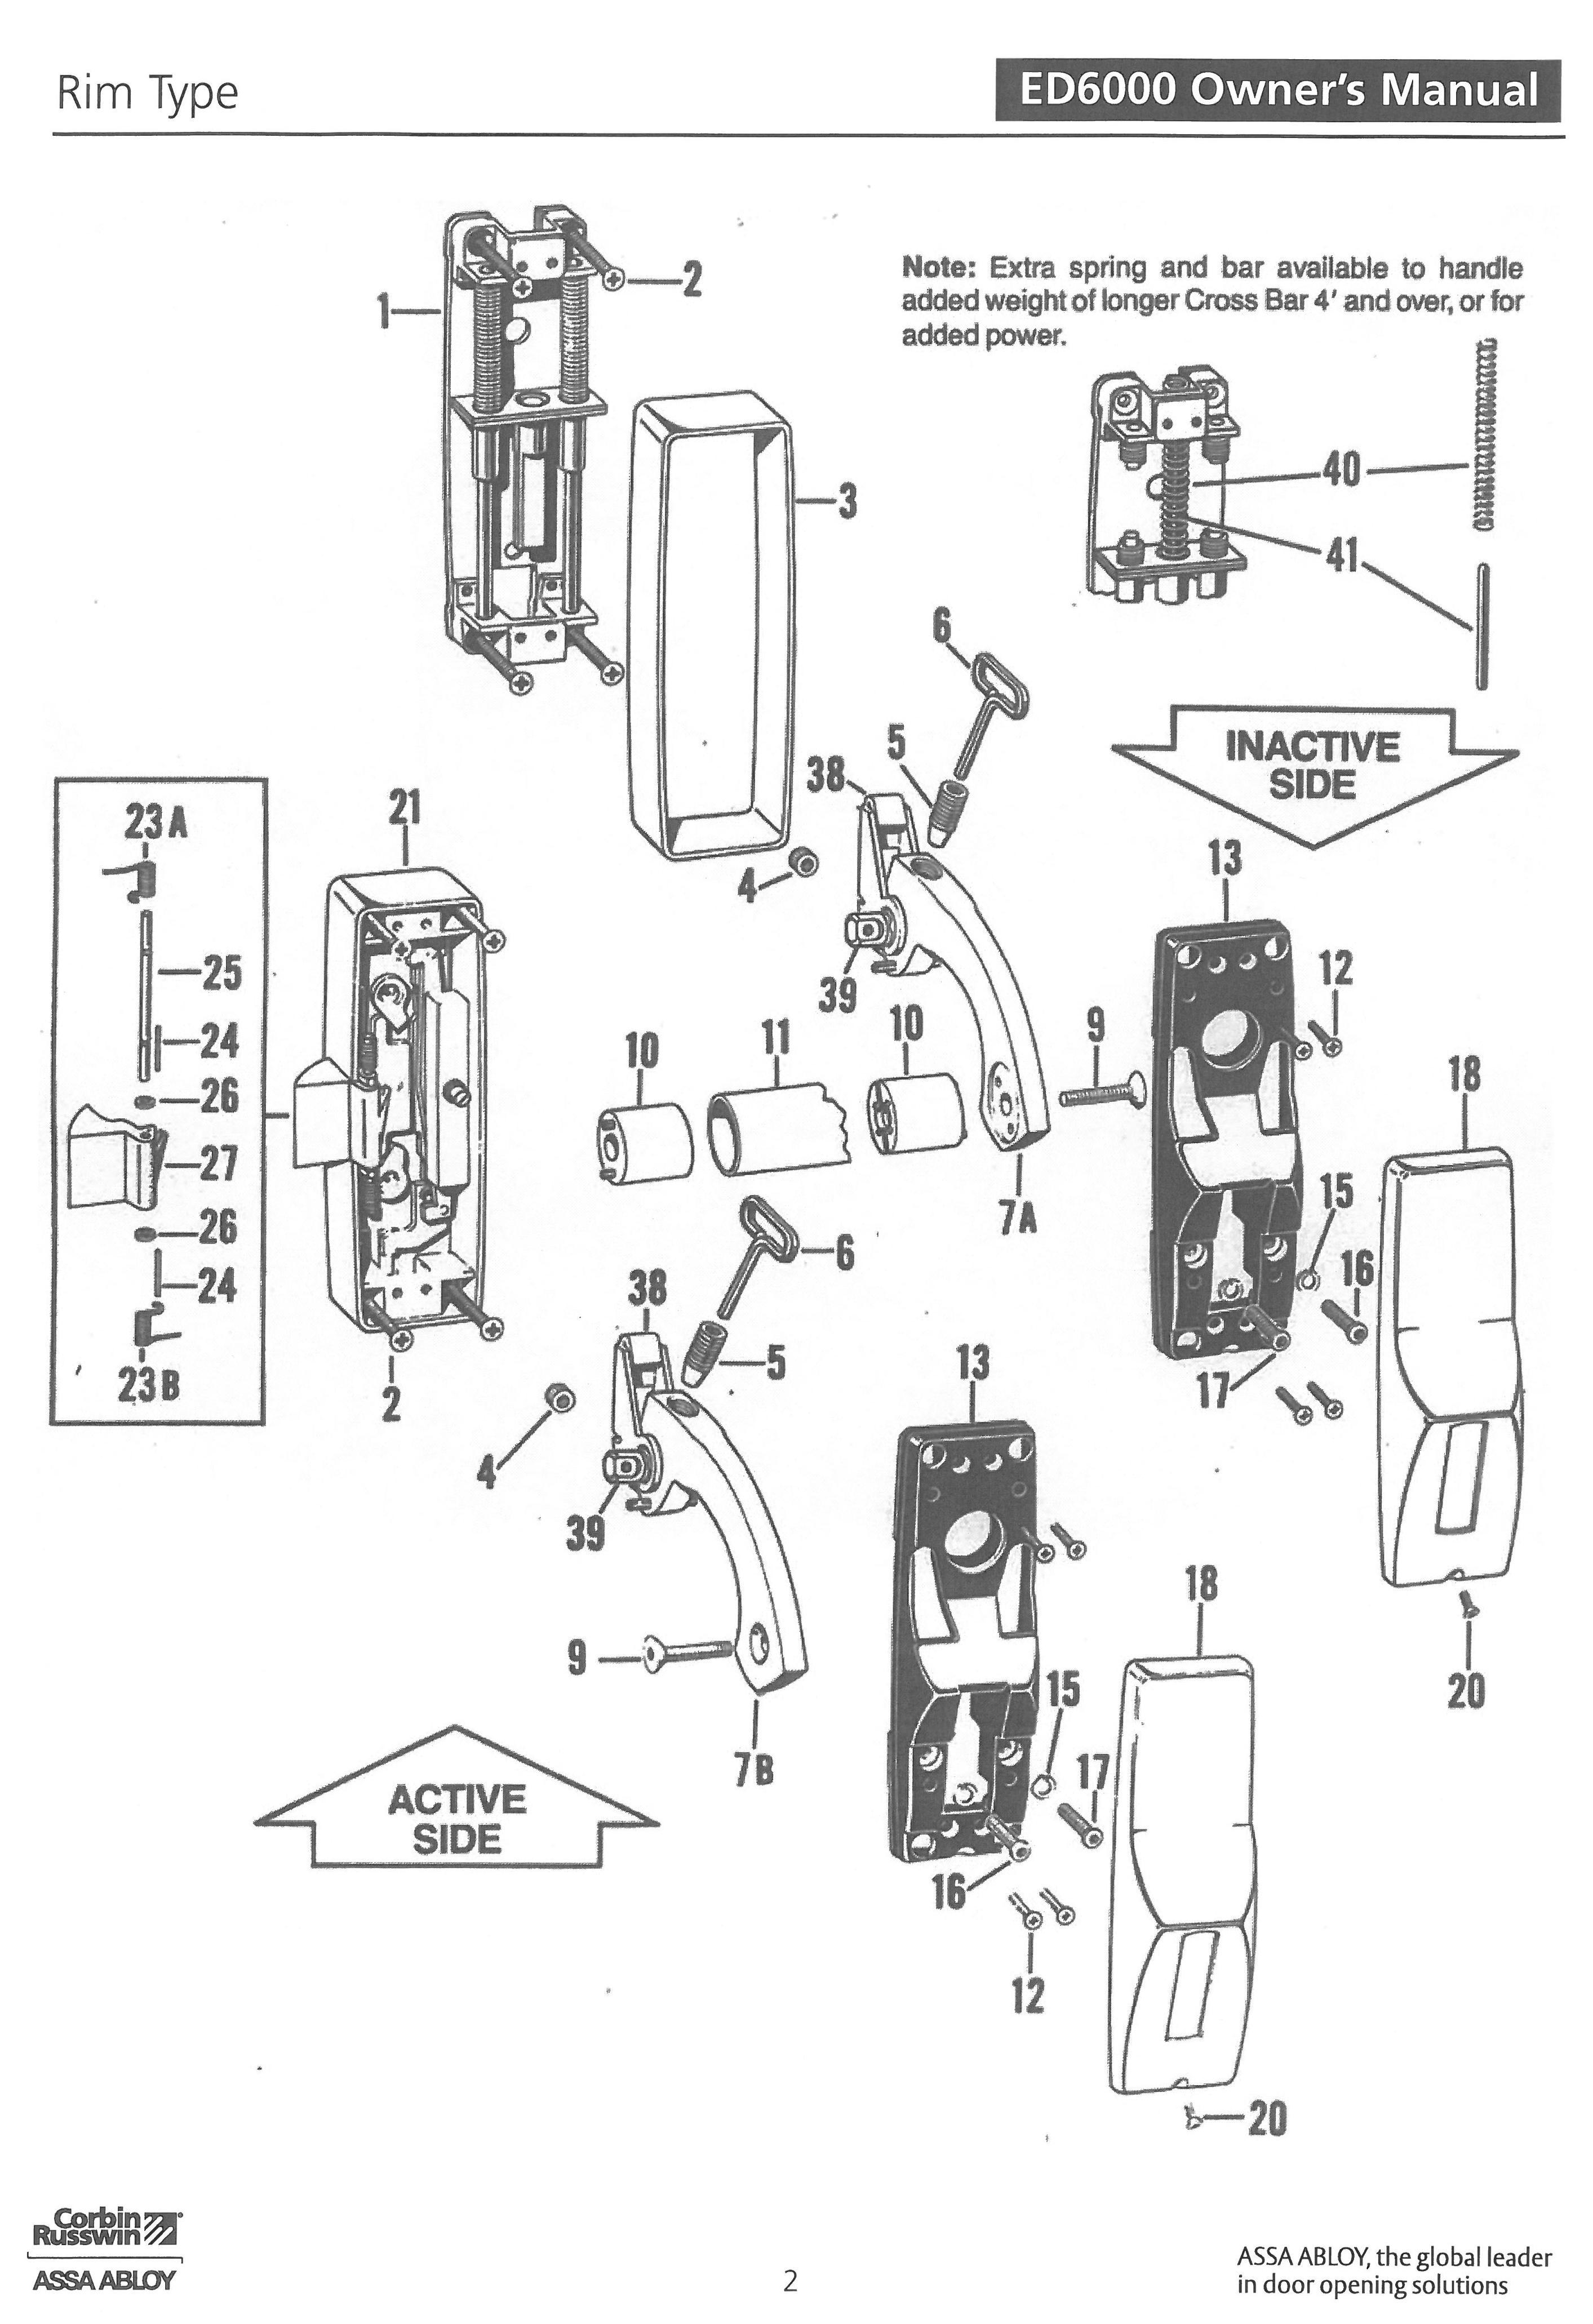 mortise lock parts diagram 7 way navigation wiring and fuse box